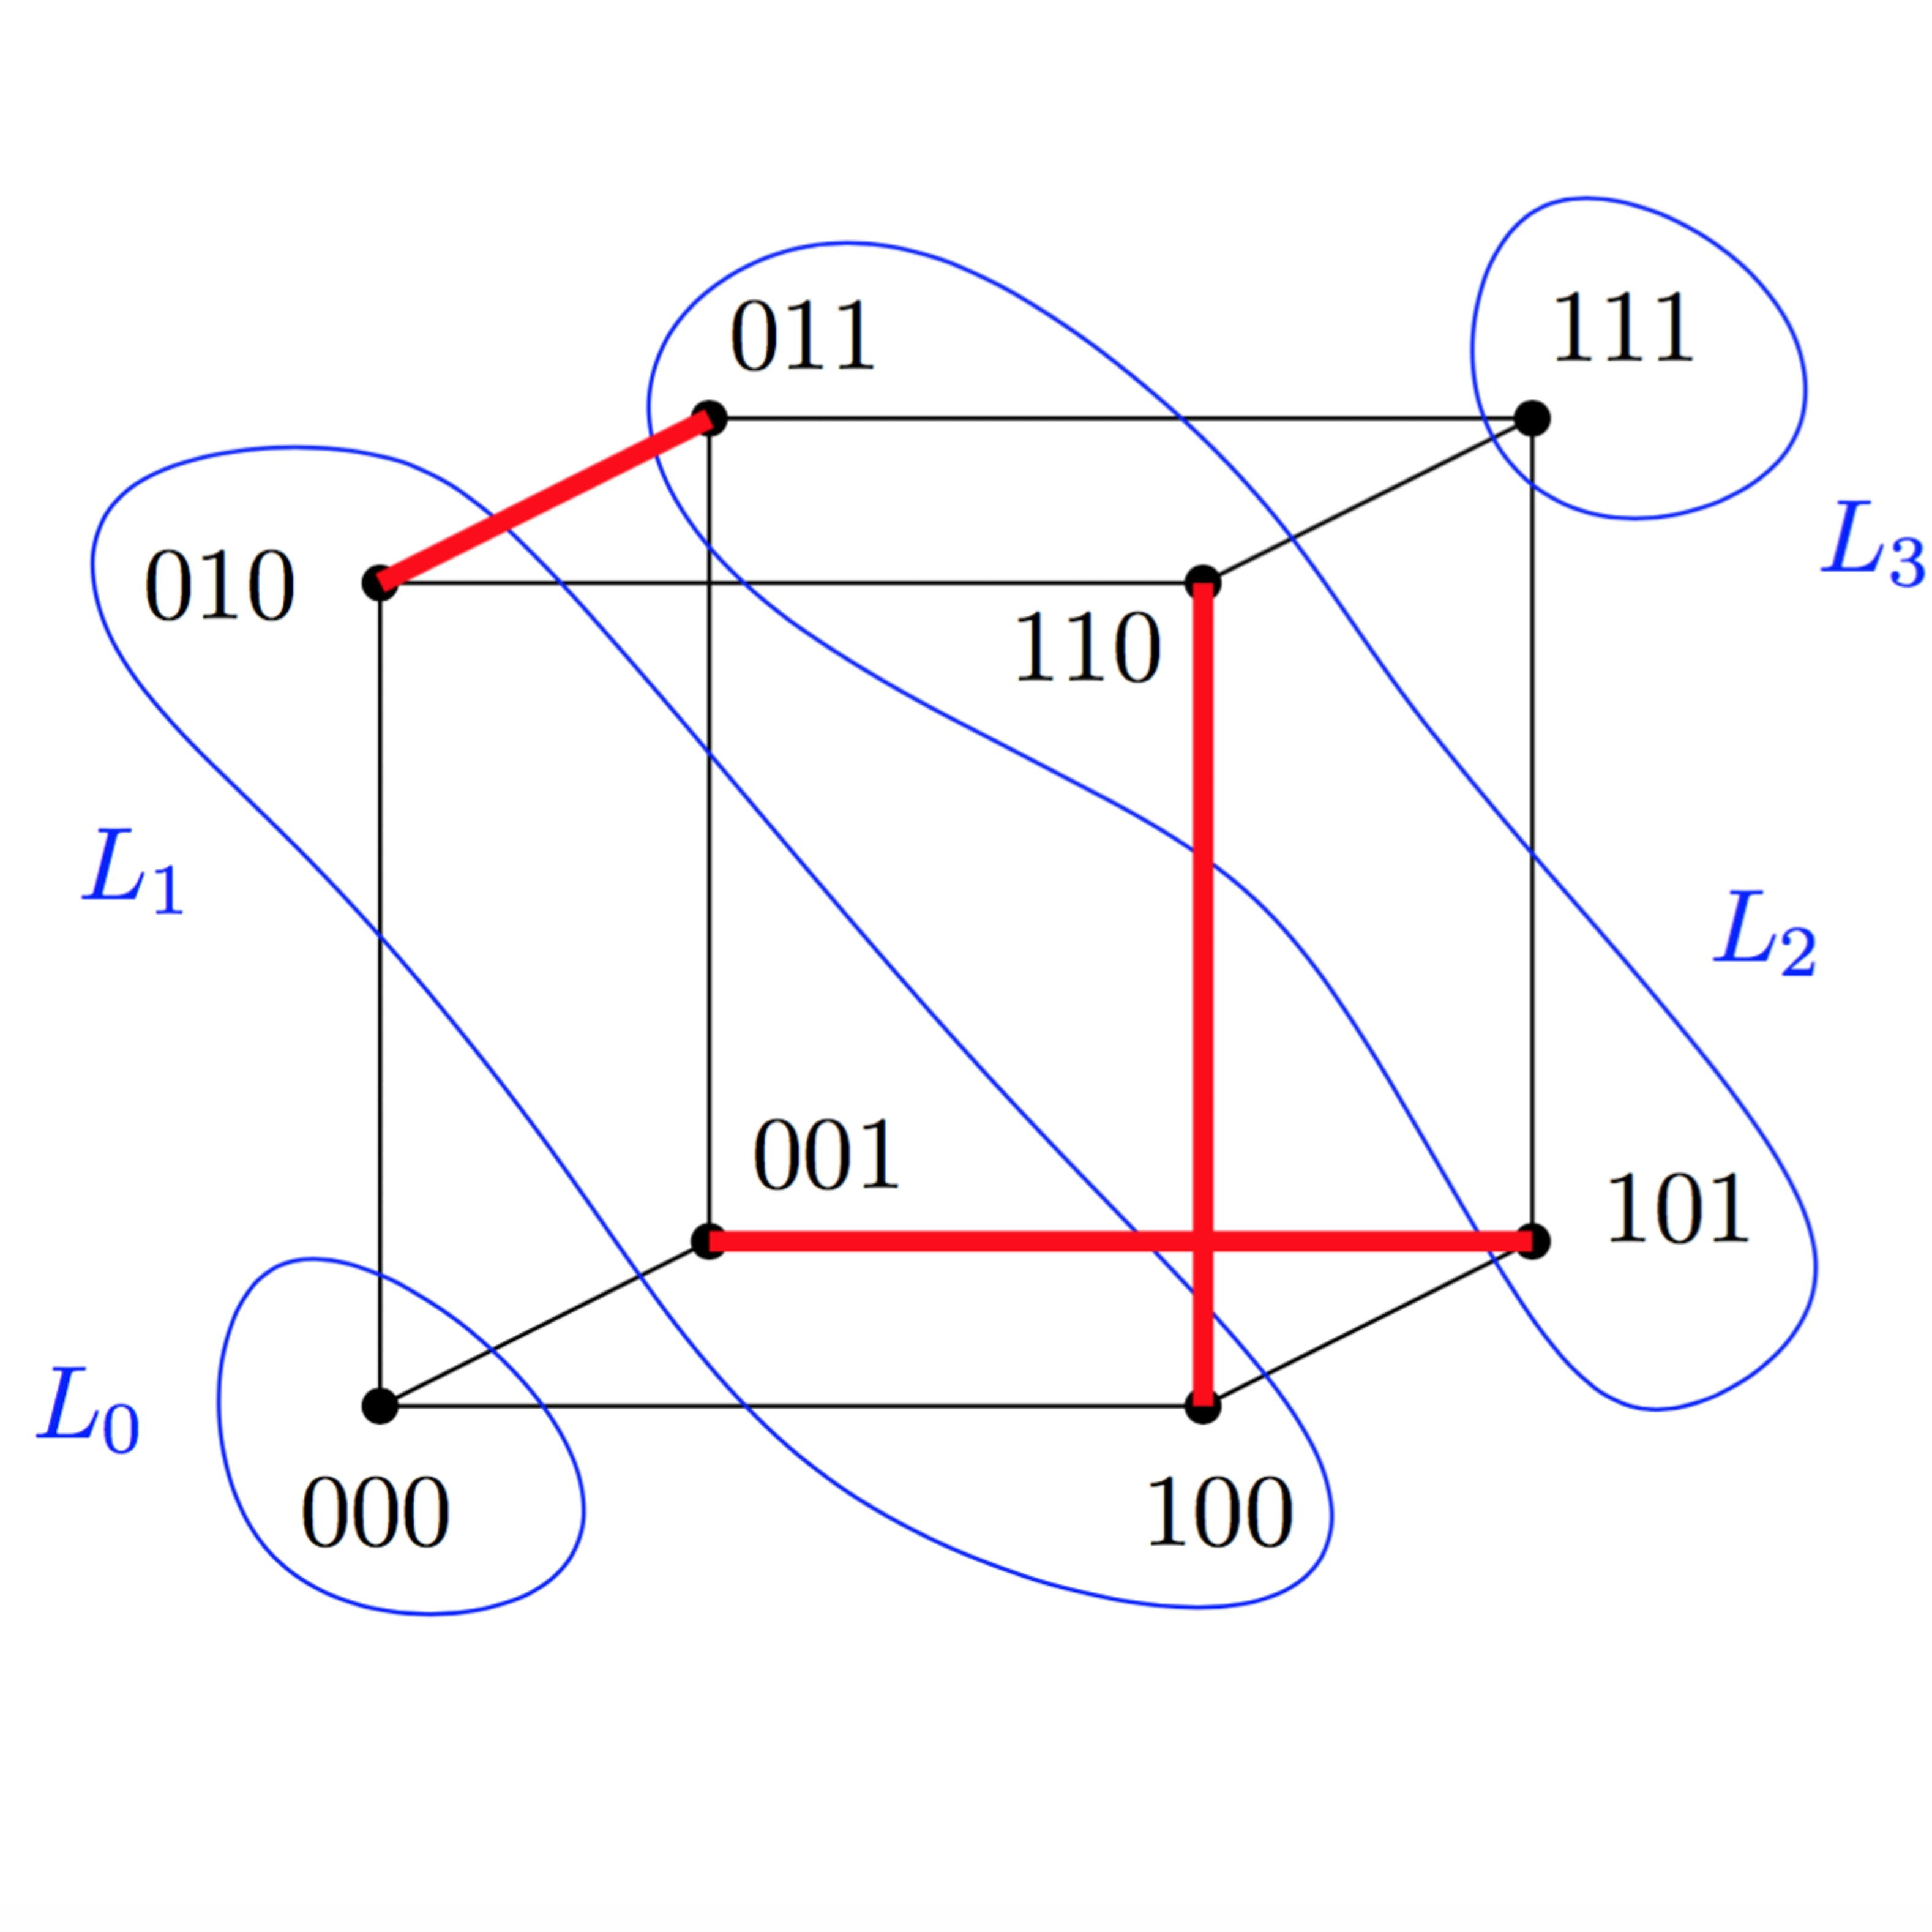 ttc discrete mathematics pdf